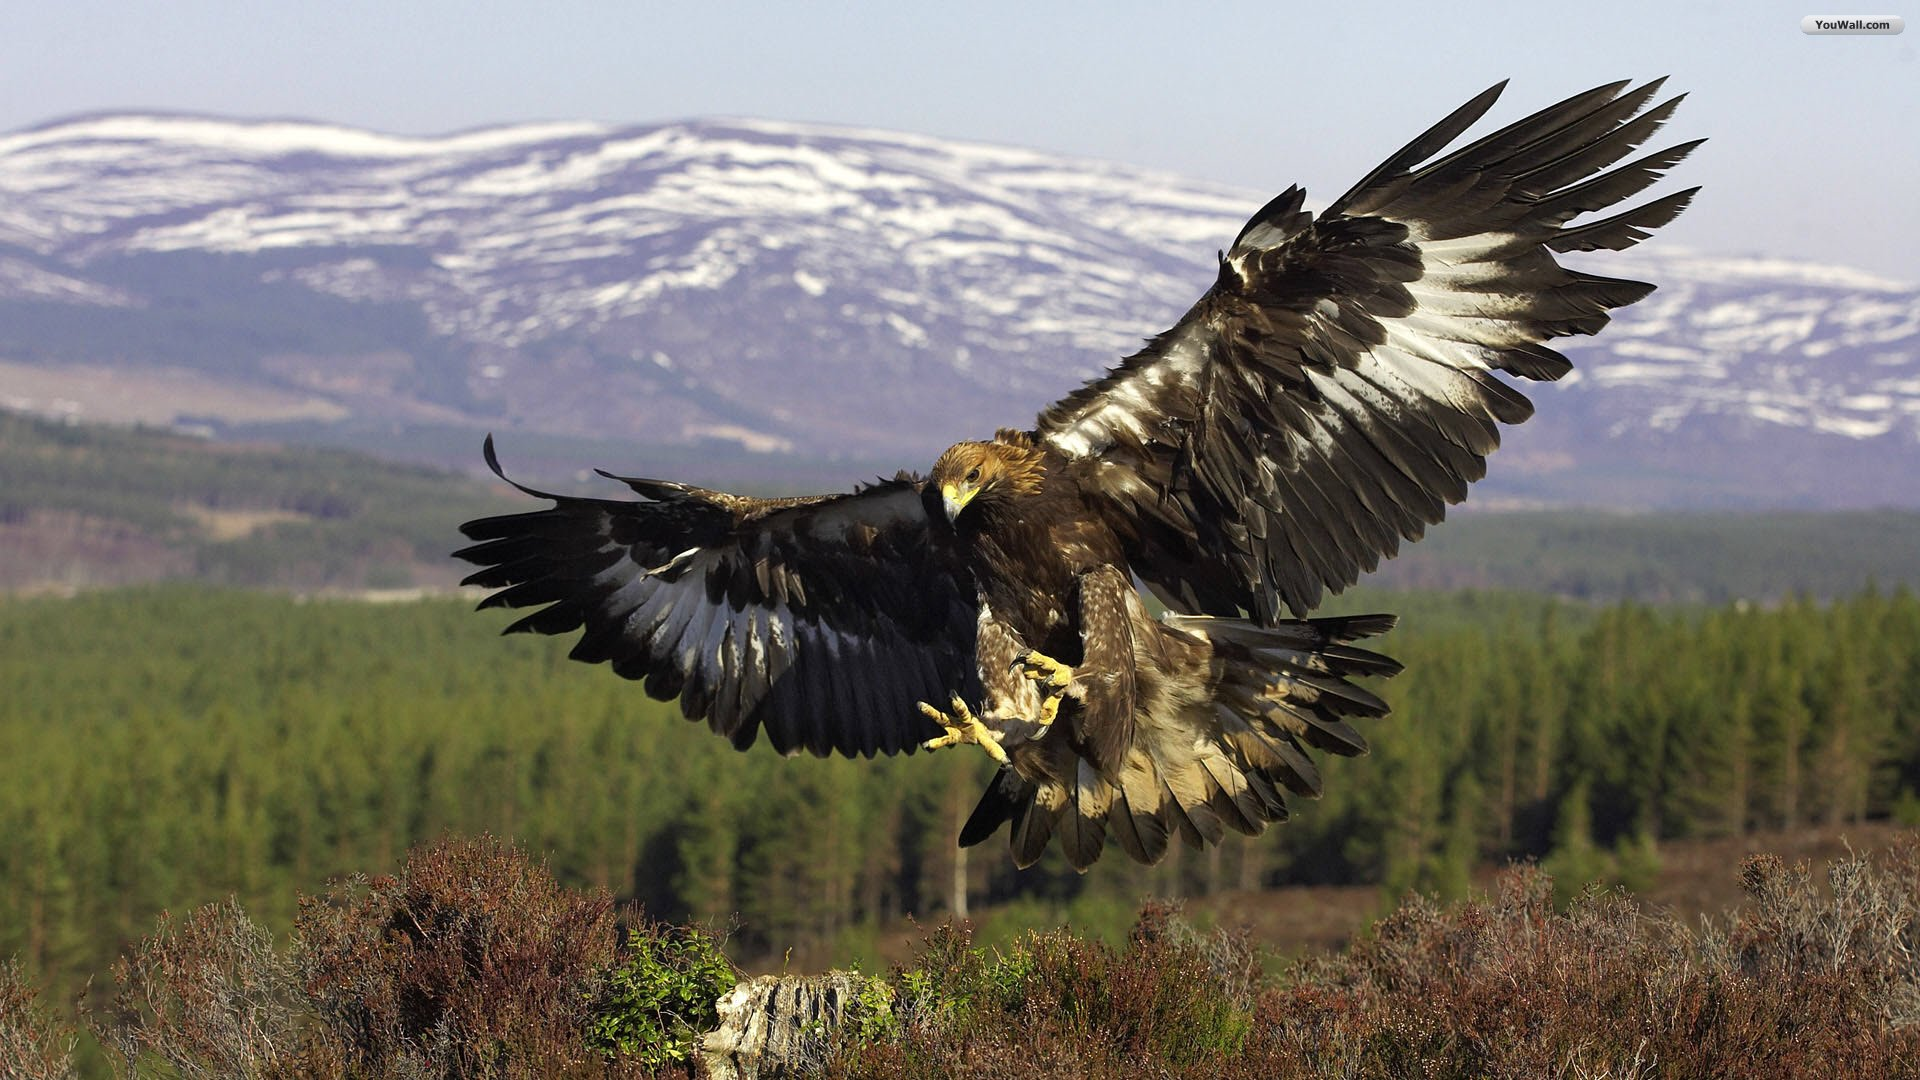 flying hawk wallpaper 1920x1080